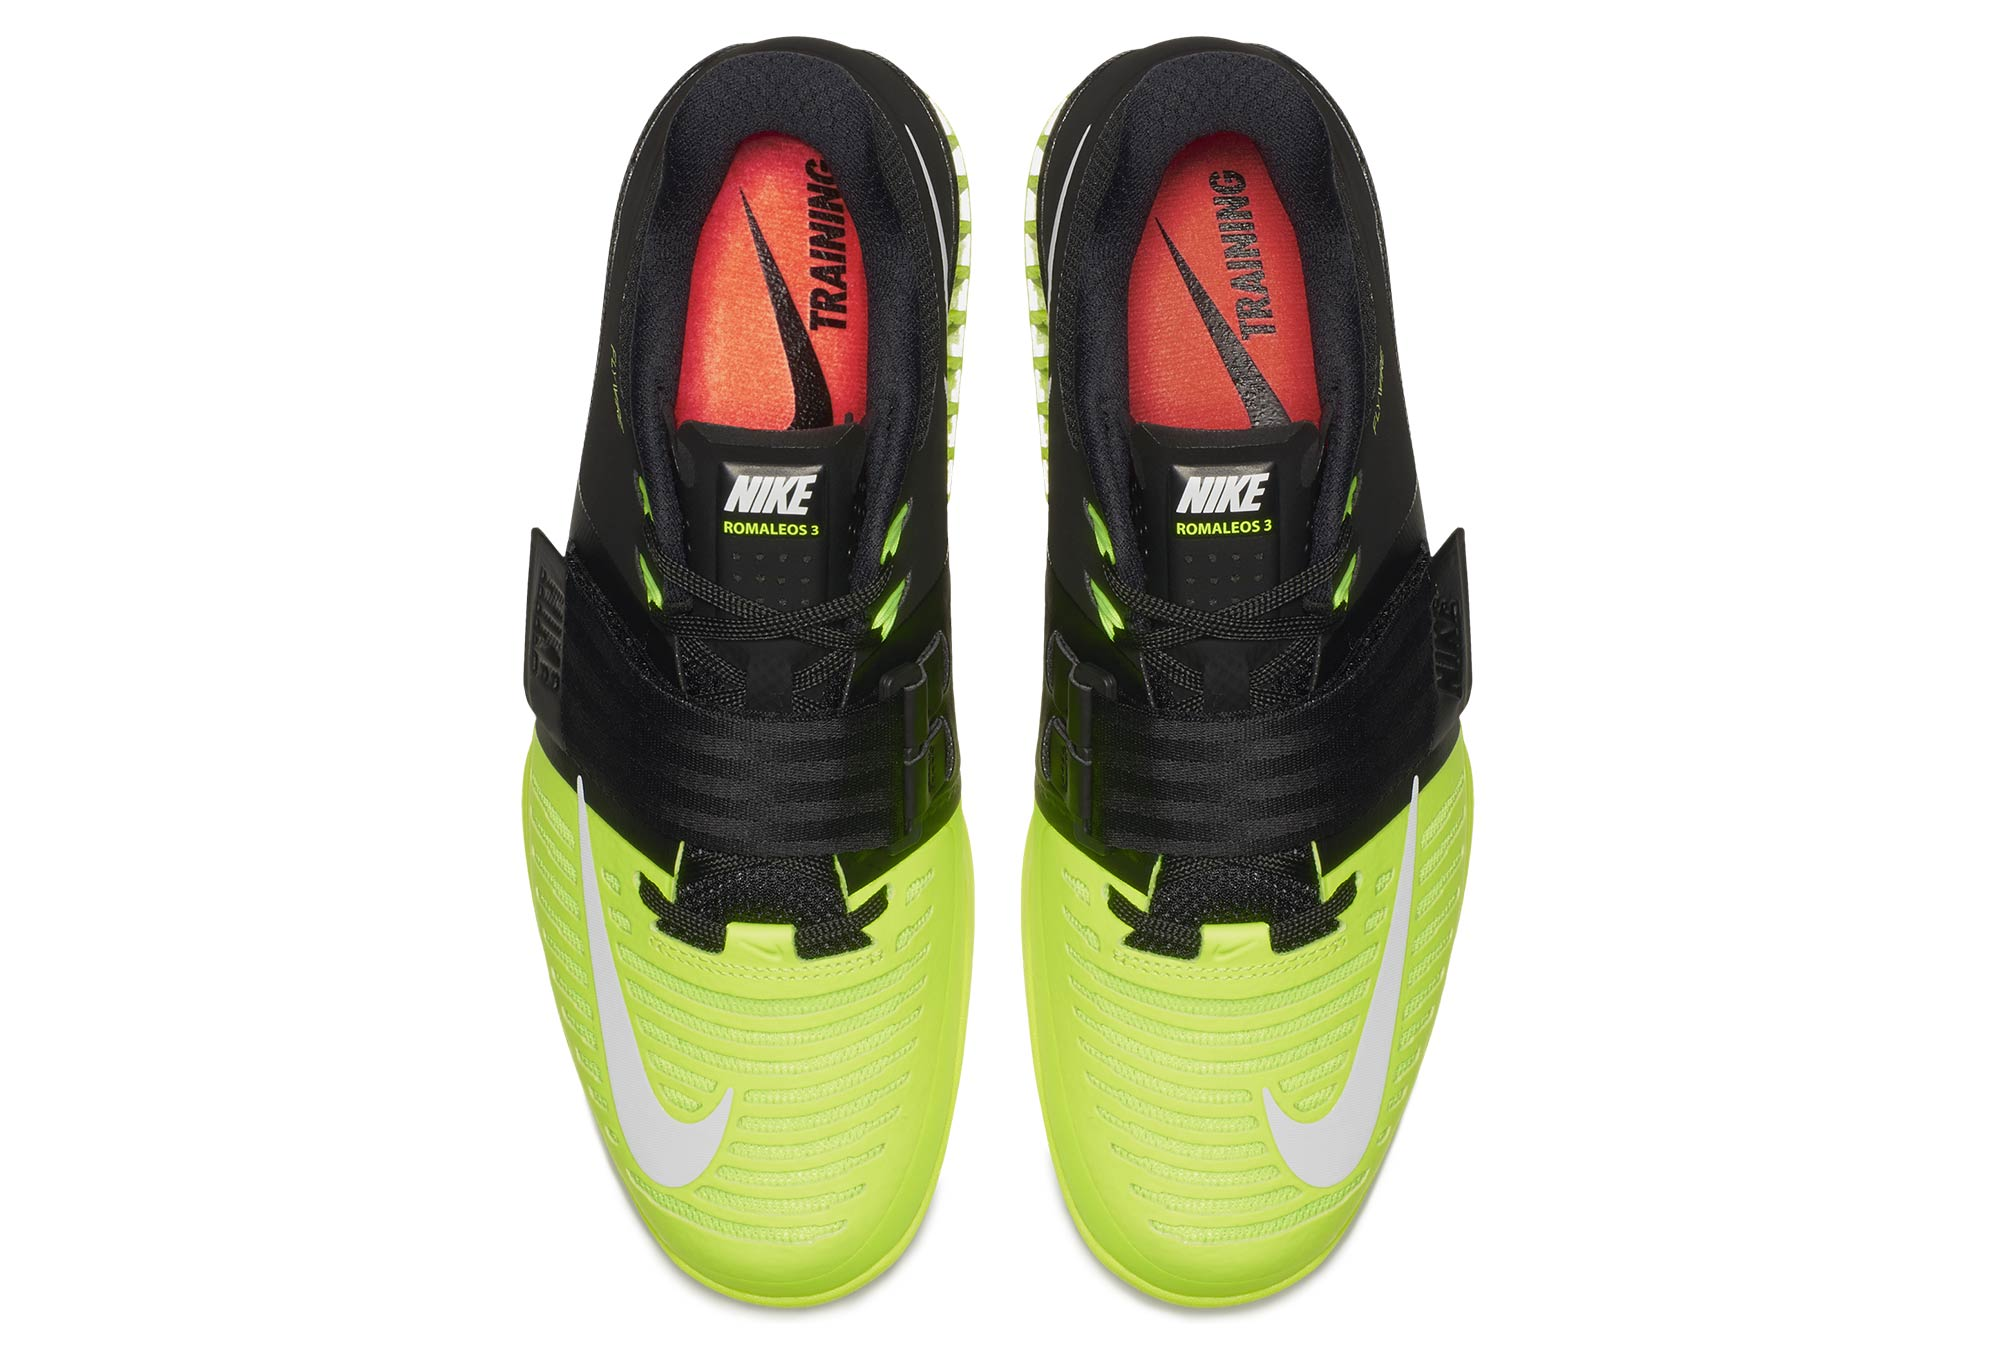 Chaussures 3 Jaune Romaleos De Nike Cross Noir Training Fluo BAT1qrBp